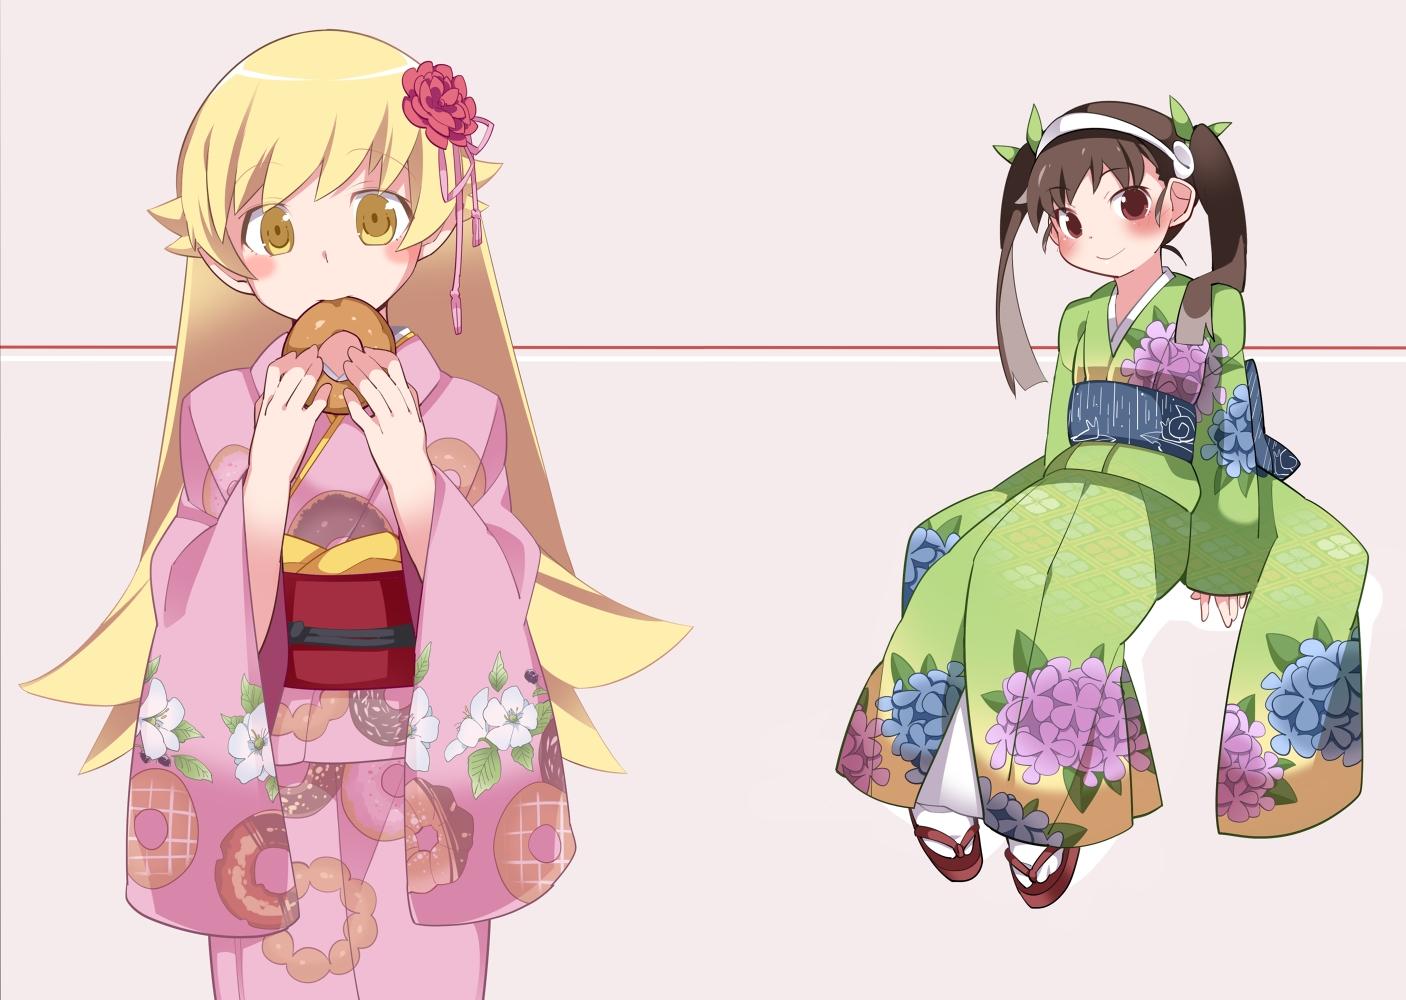 2girls bakemonogatari hachikuji_mayoi hammer_(sunset_beach) japanese_clothes kimono loli monogatari_(series) oshino_shinobu